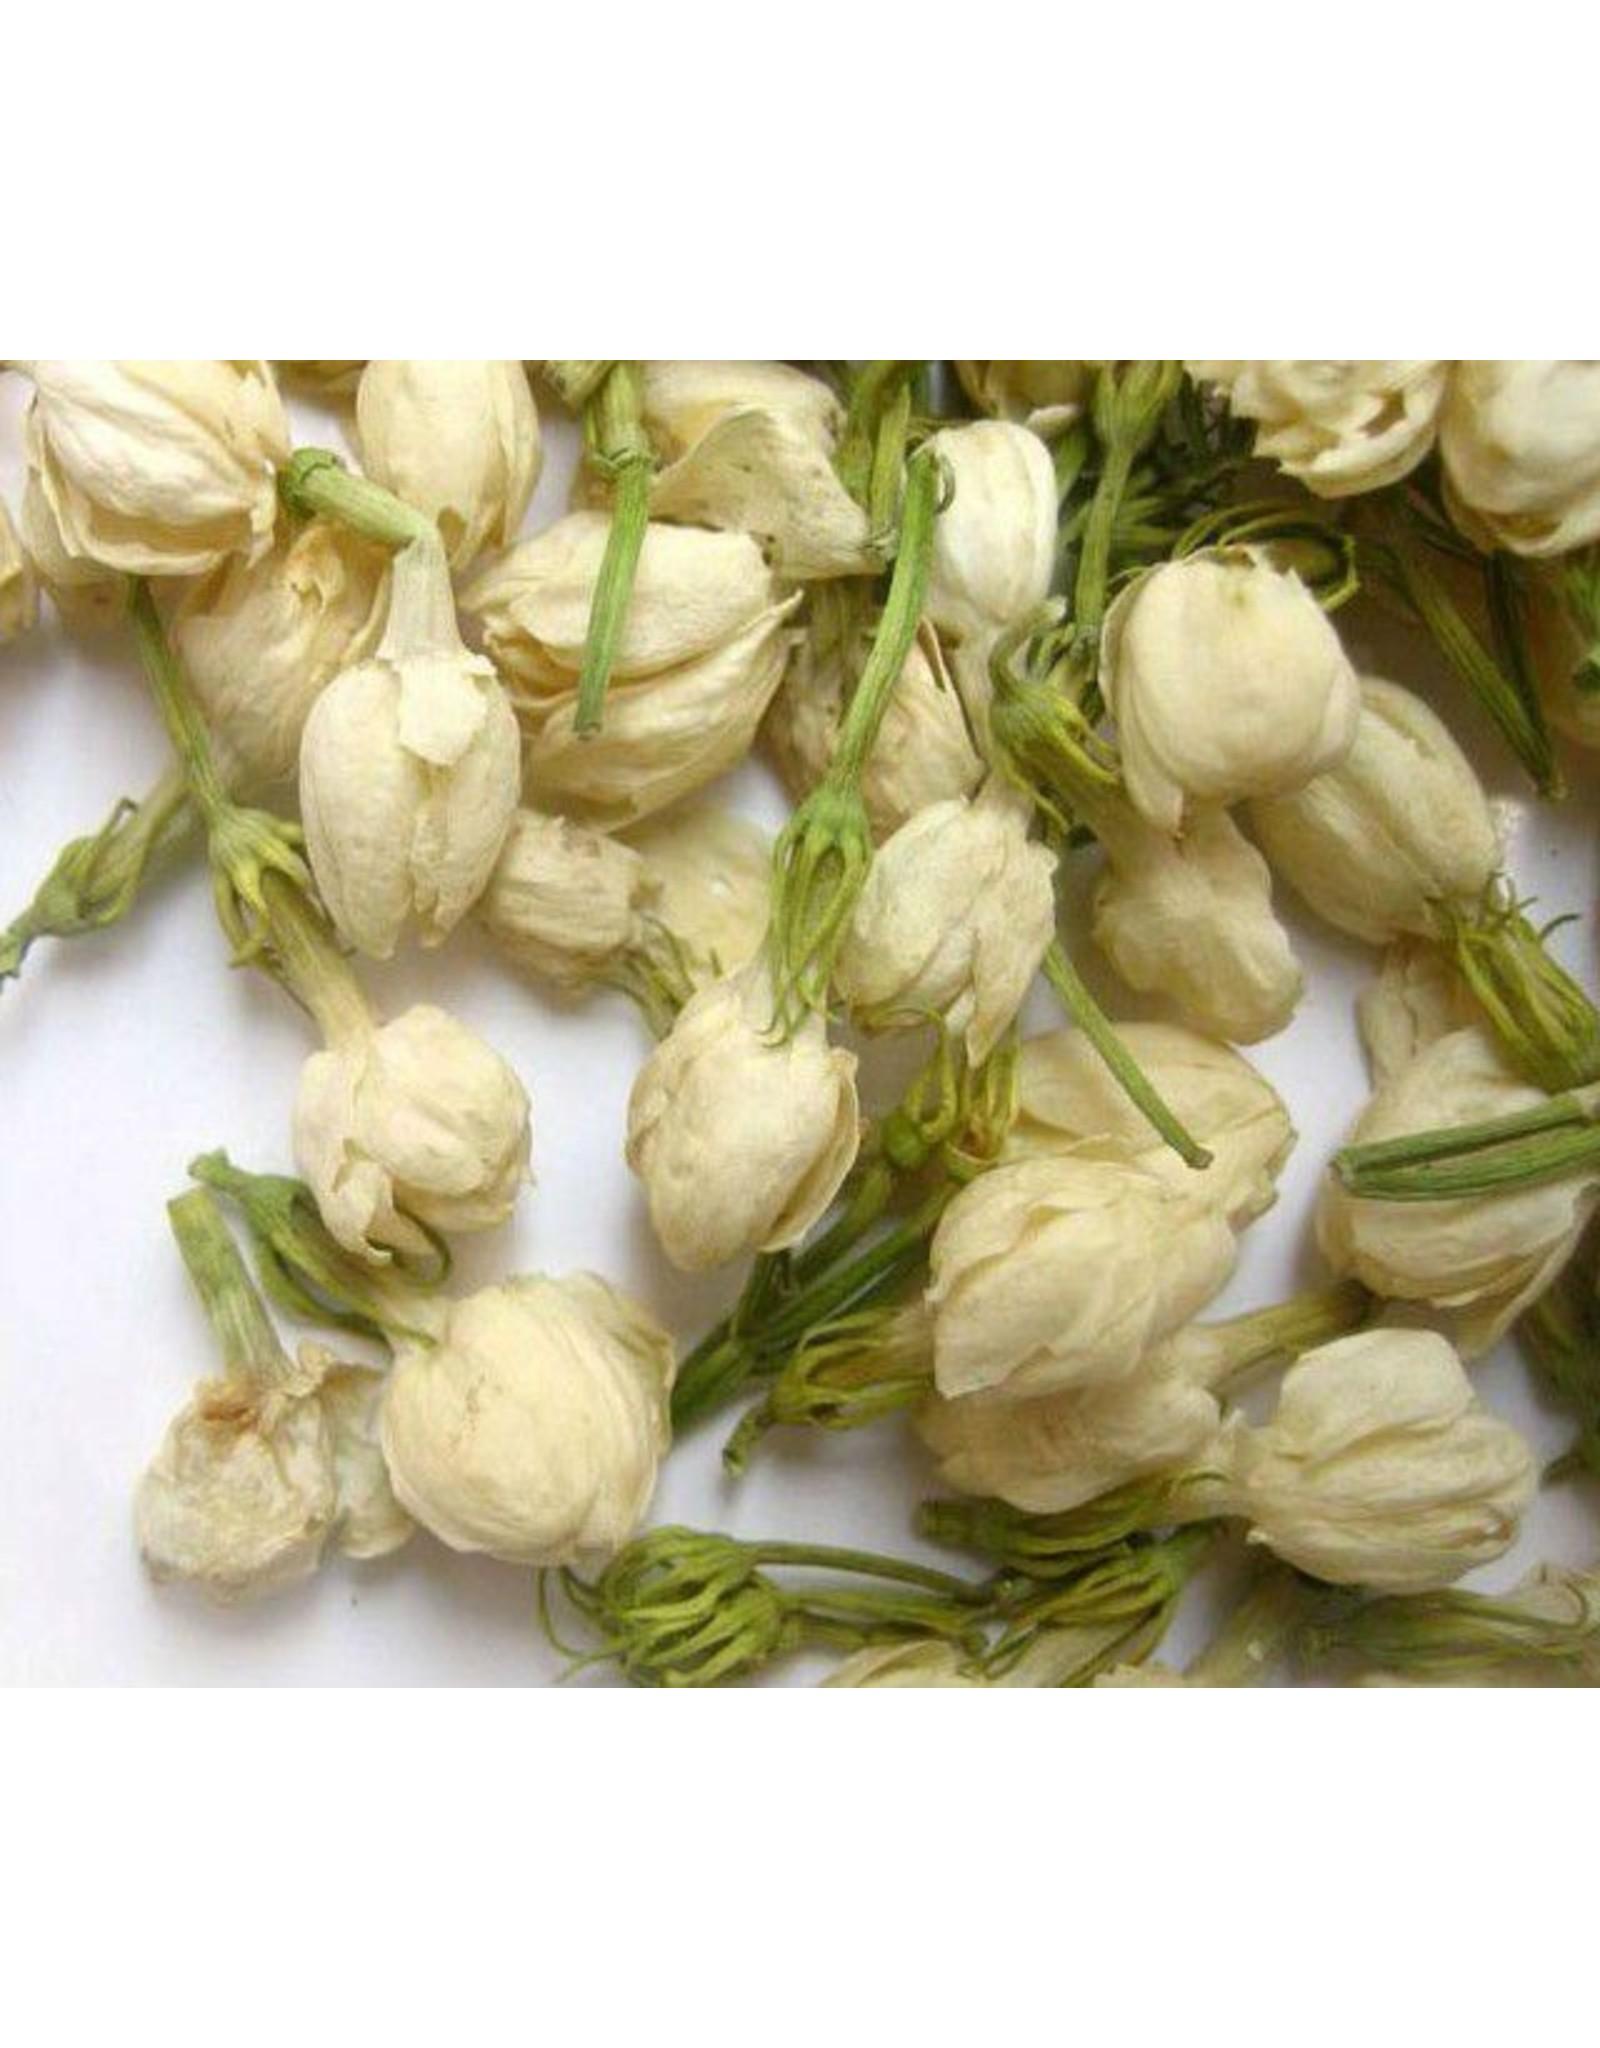 Jasmine Flowers 1 oz